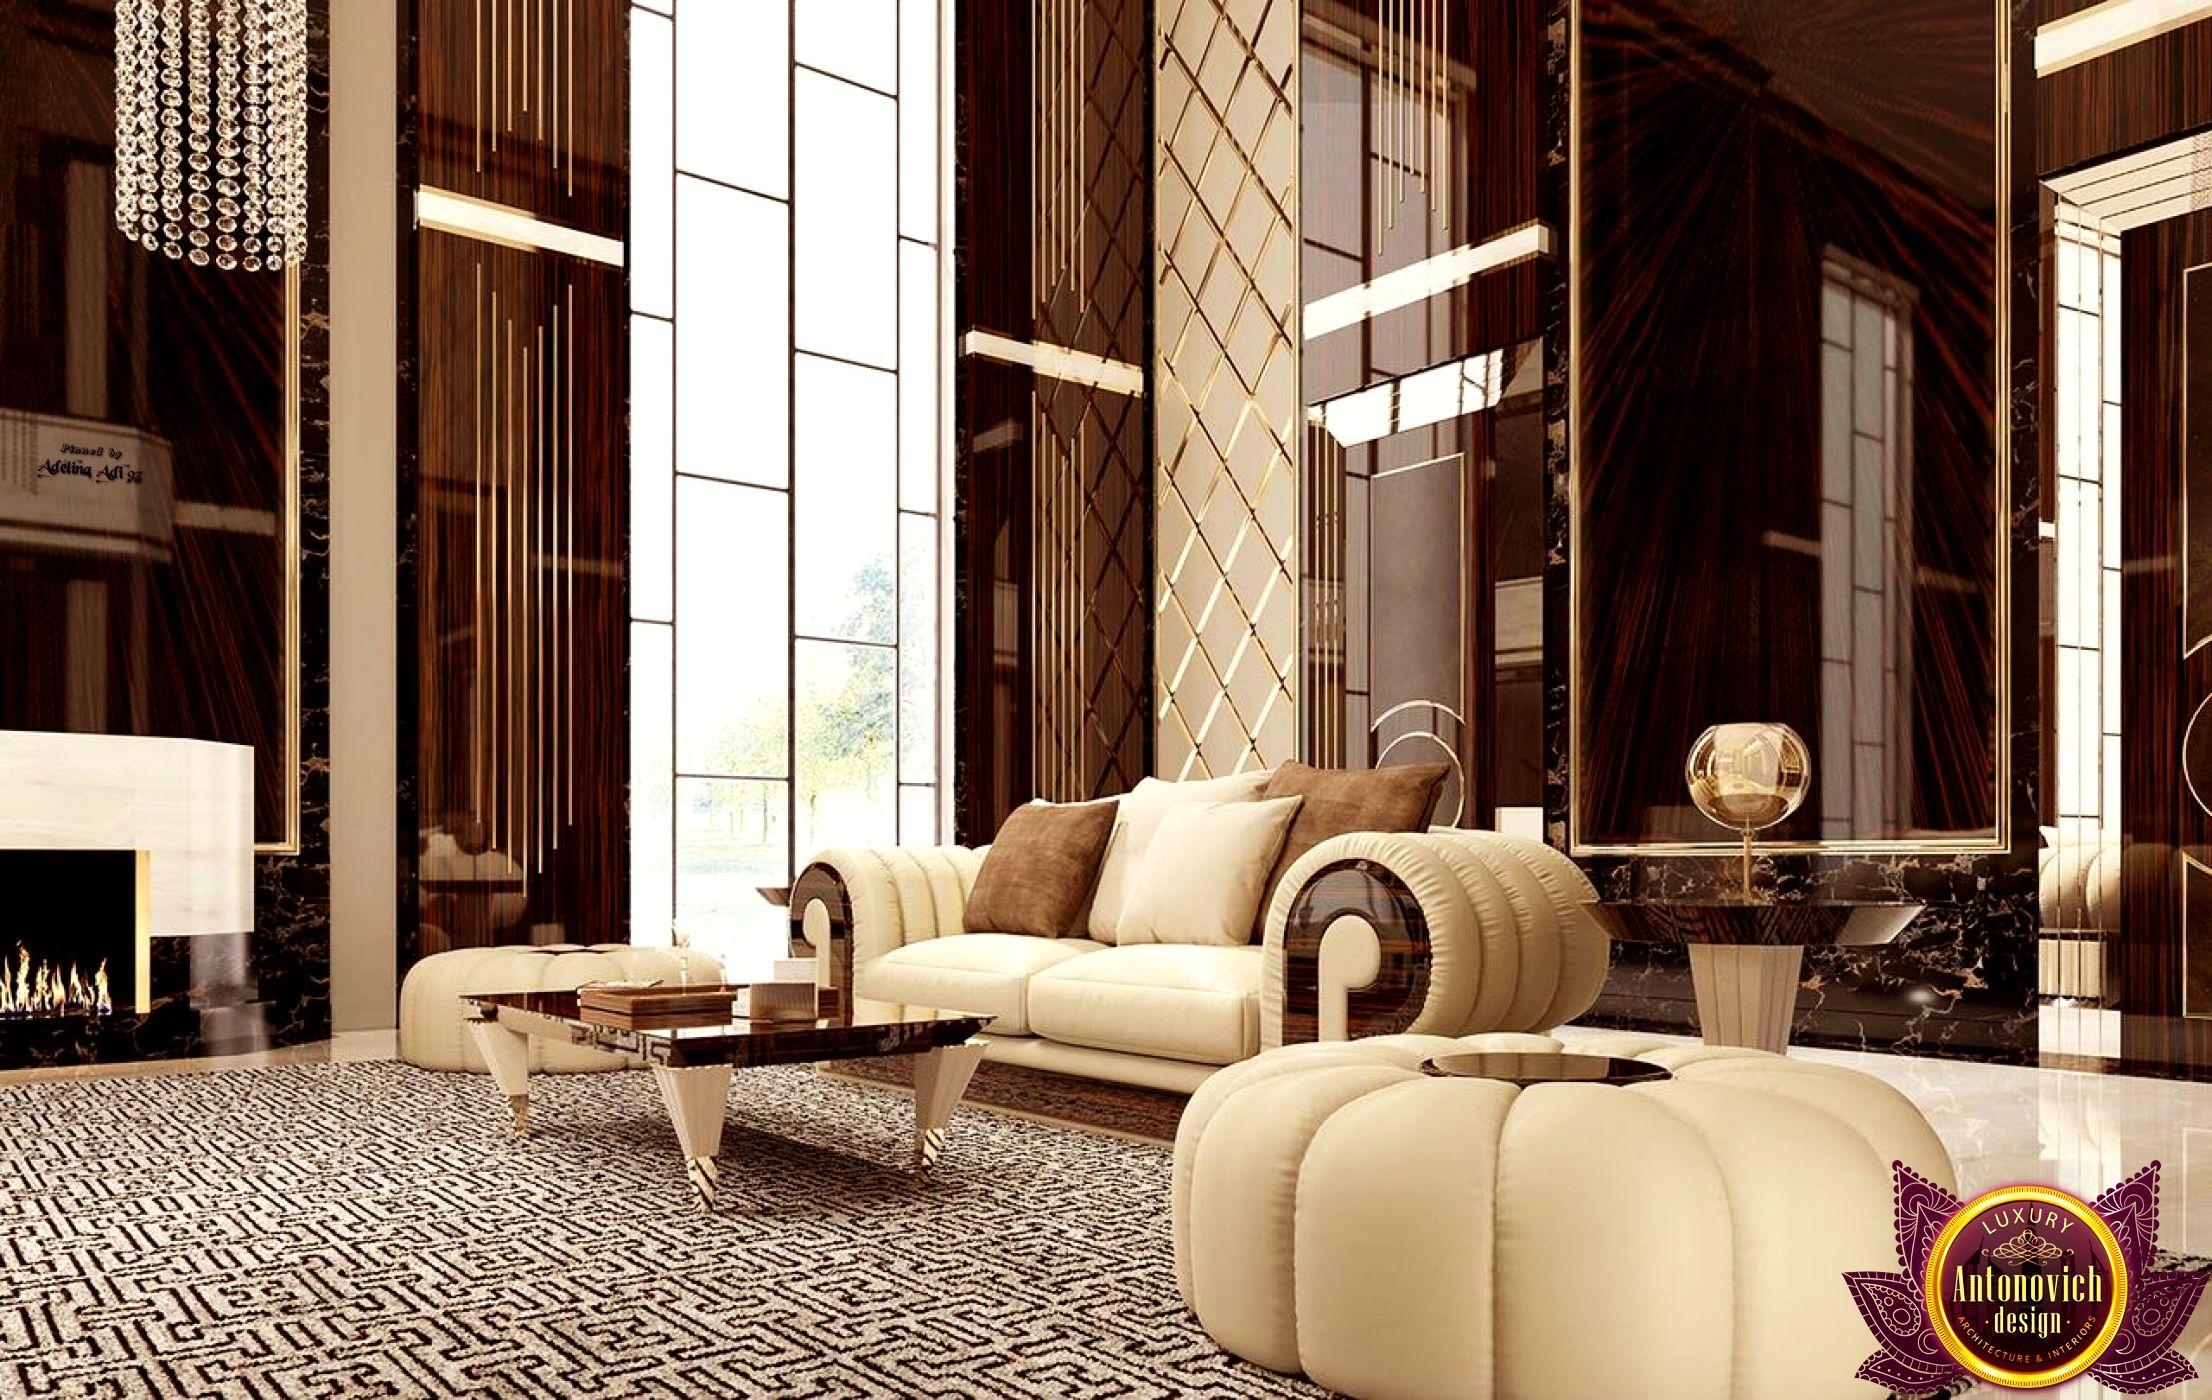 Luxury #RichLife | InTEriOR - EXteRIoR (Homes) 2 | Pinterest | Luxus